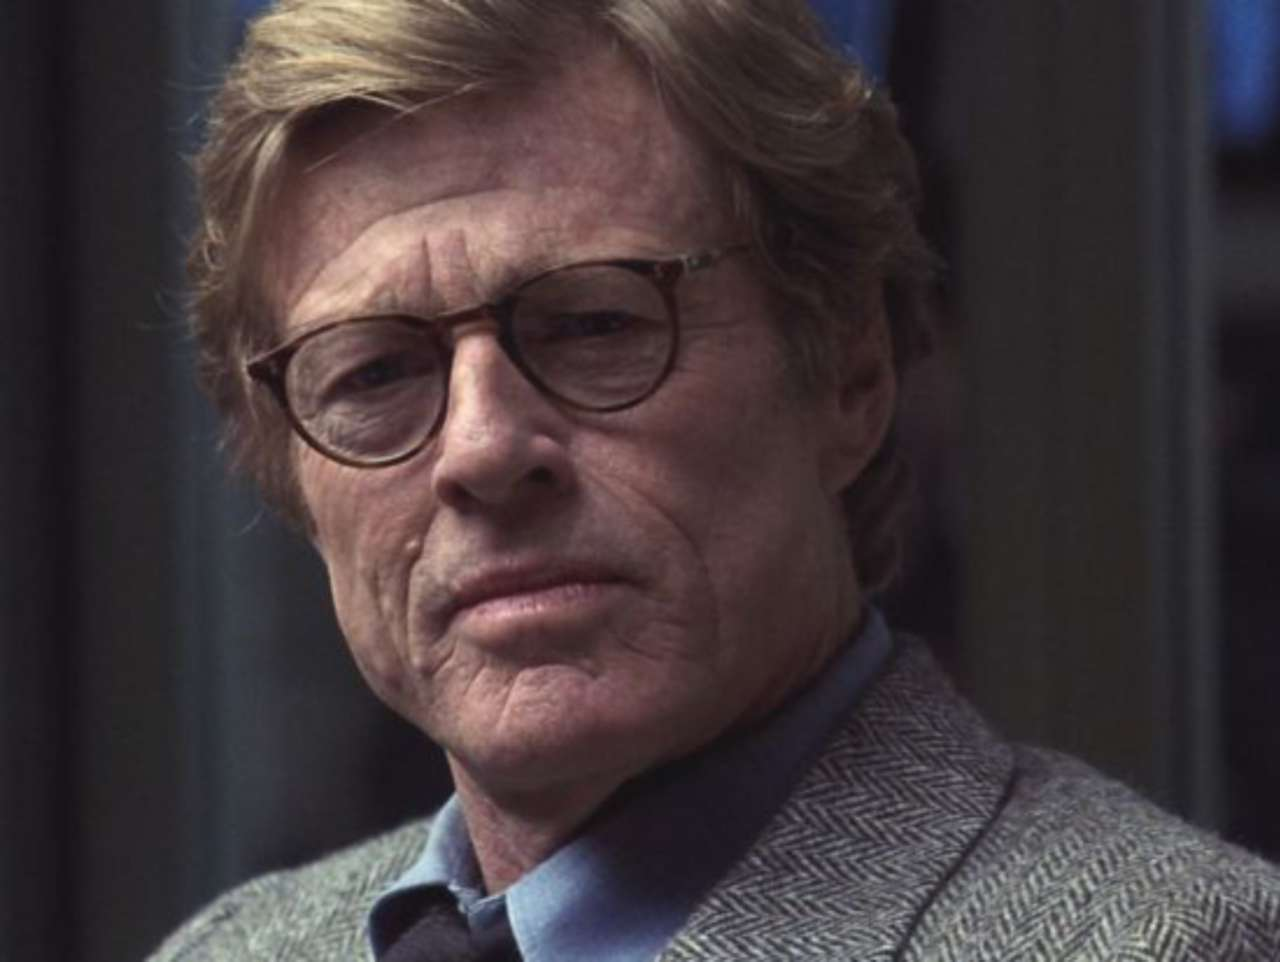 Robert Redford to Play President Robert Redford in HBO's Watchmen